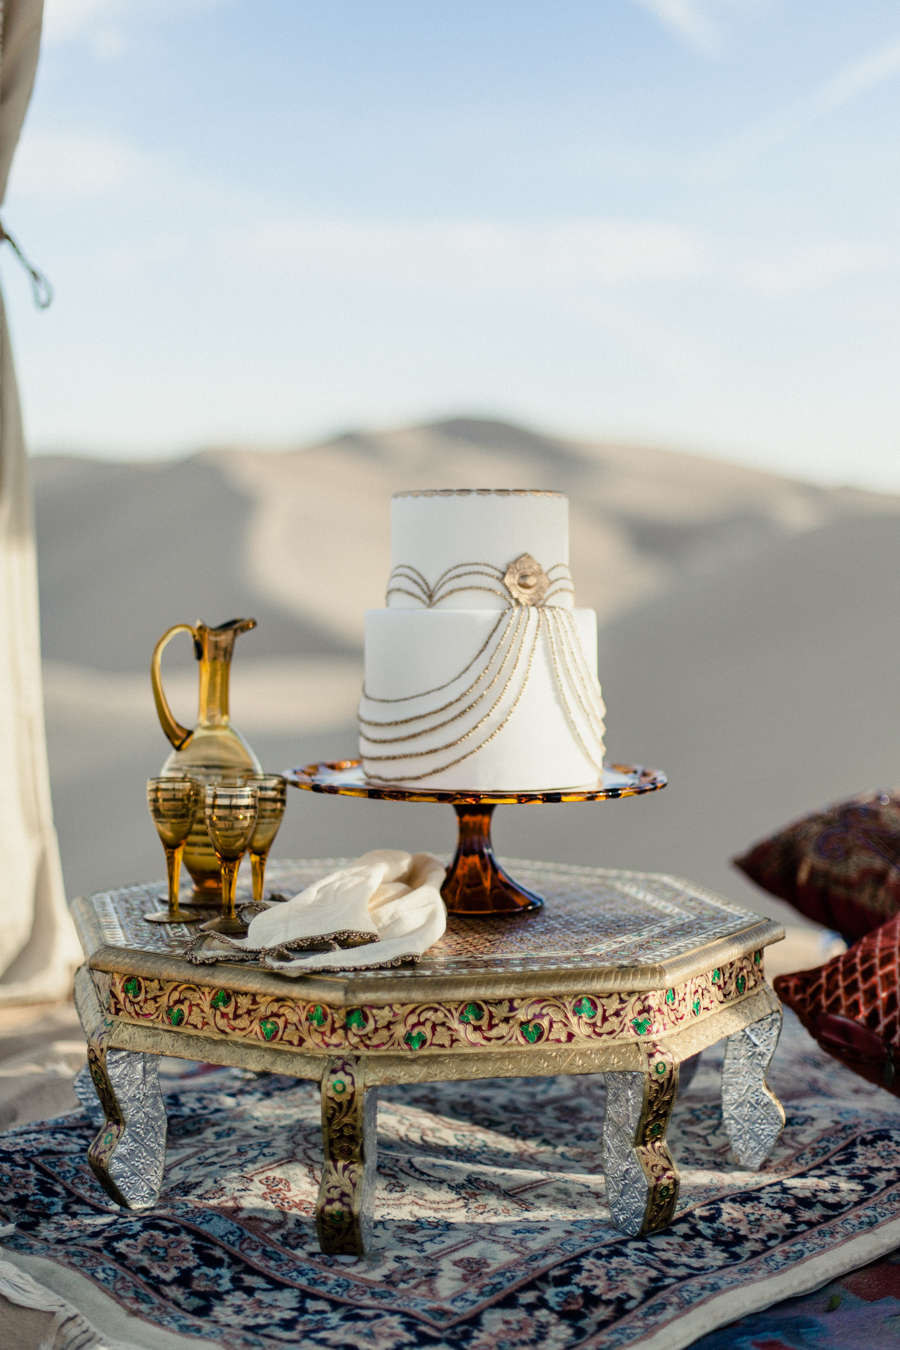 MK_Sadler_Moroccan-158_905.jpg